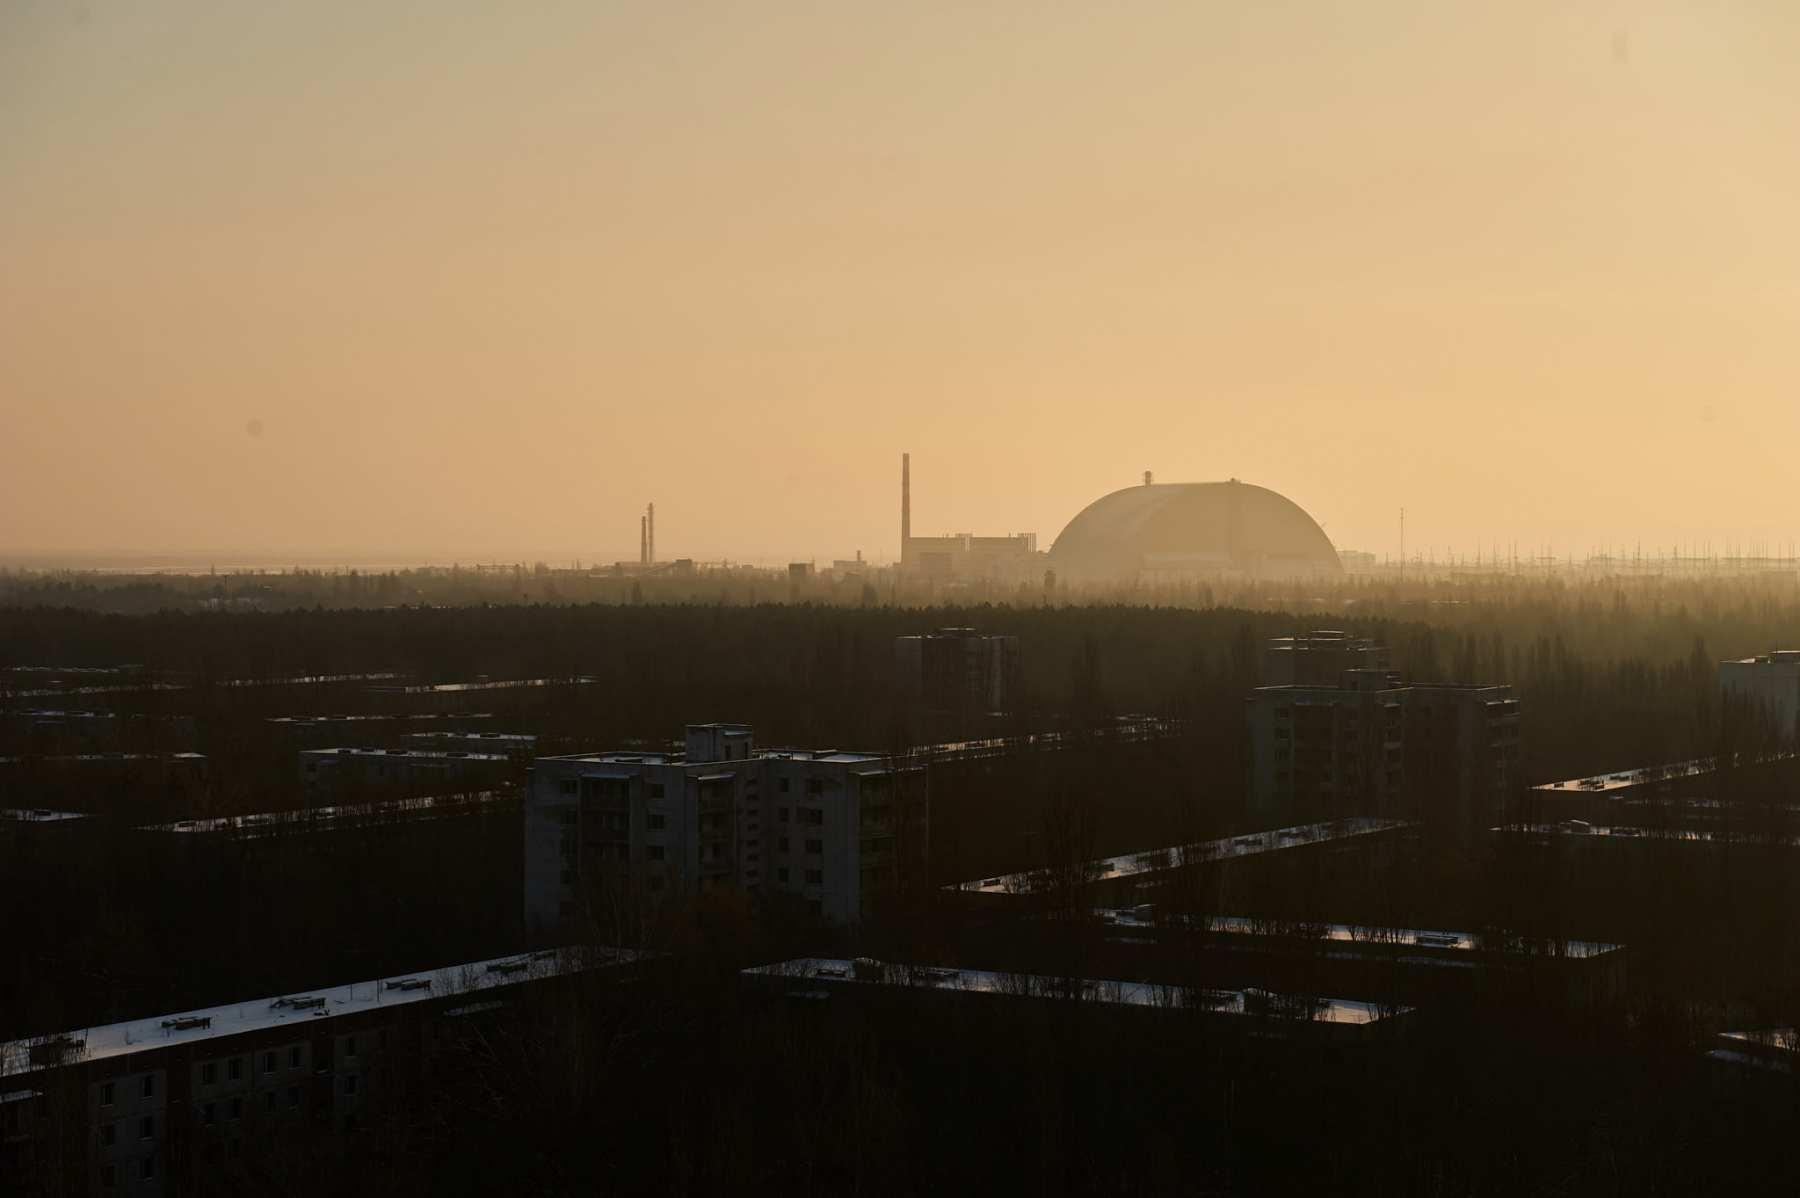 Czarnobyl_p1_025